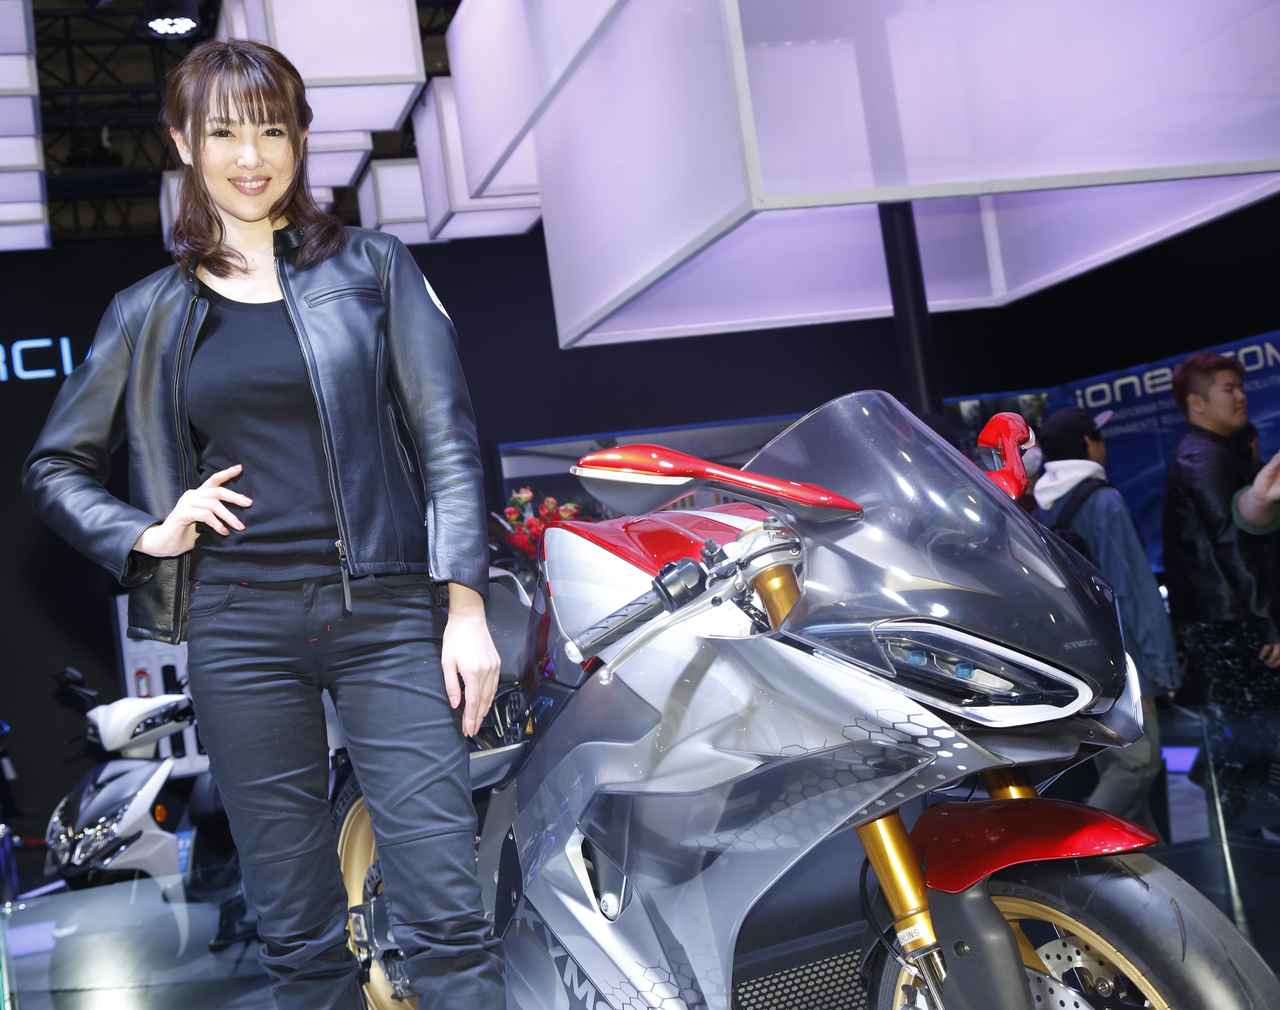 Images : 5番目の画像 - TMCS2019 美女コンパニオン図鑑! - webオートバイ